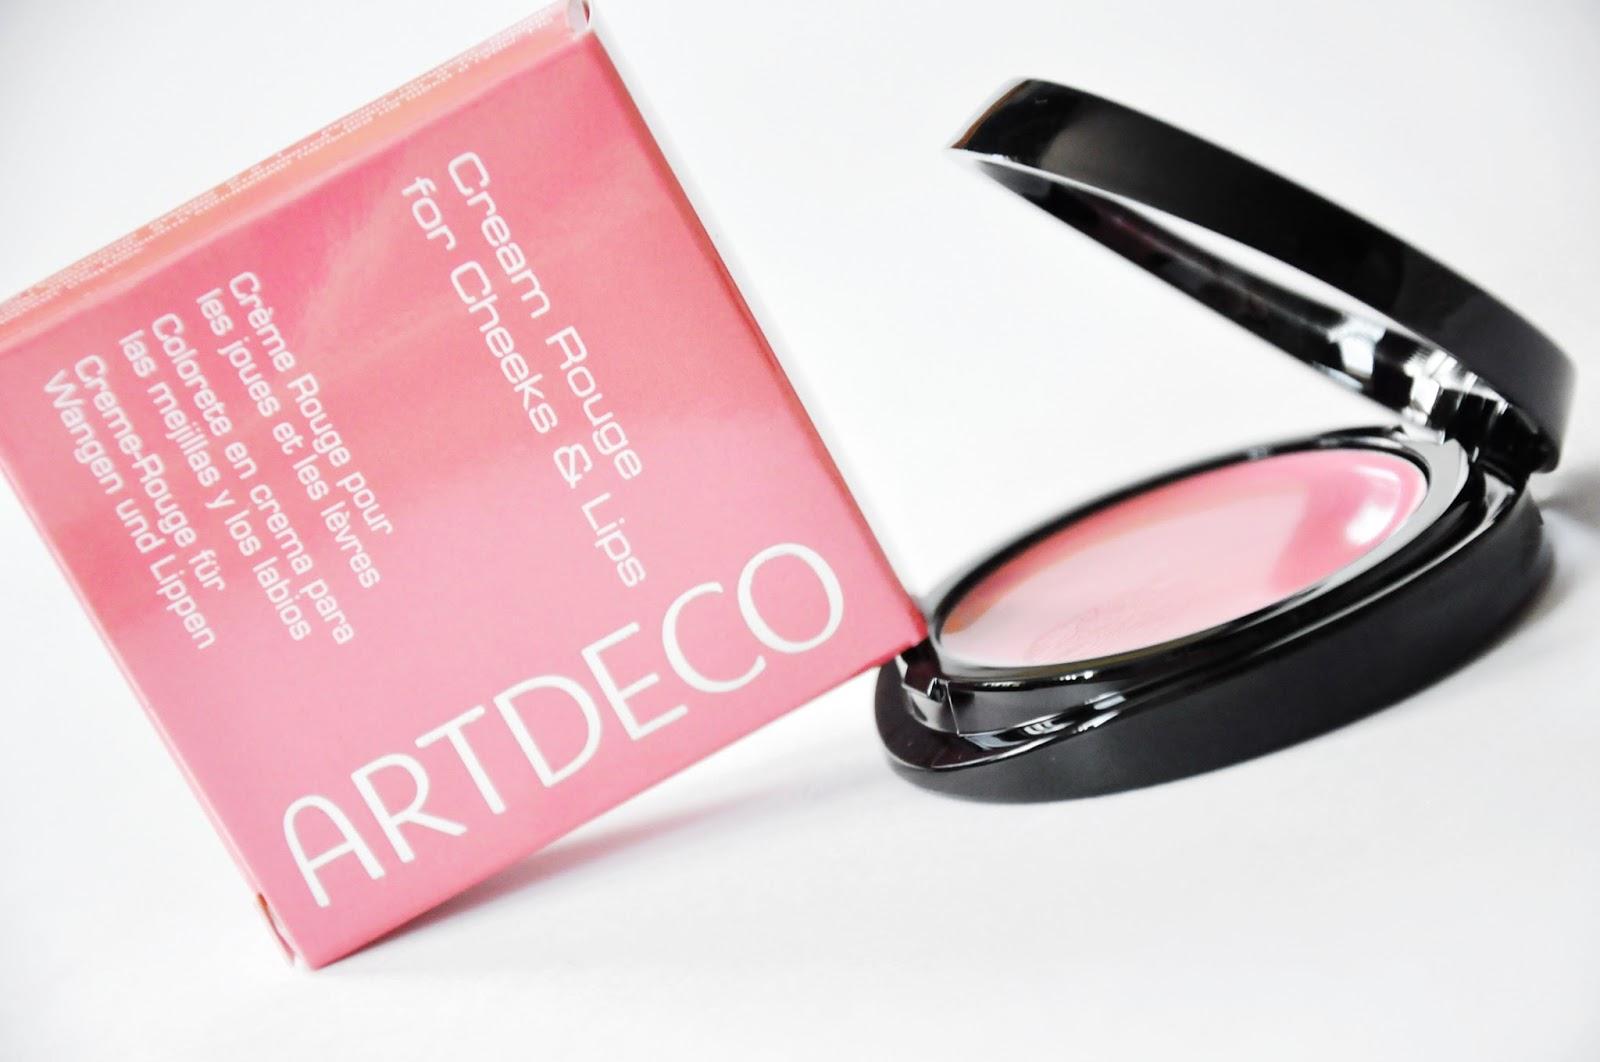 ArtDeco Cream Rouge for Cheeks and Lips